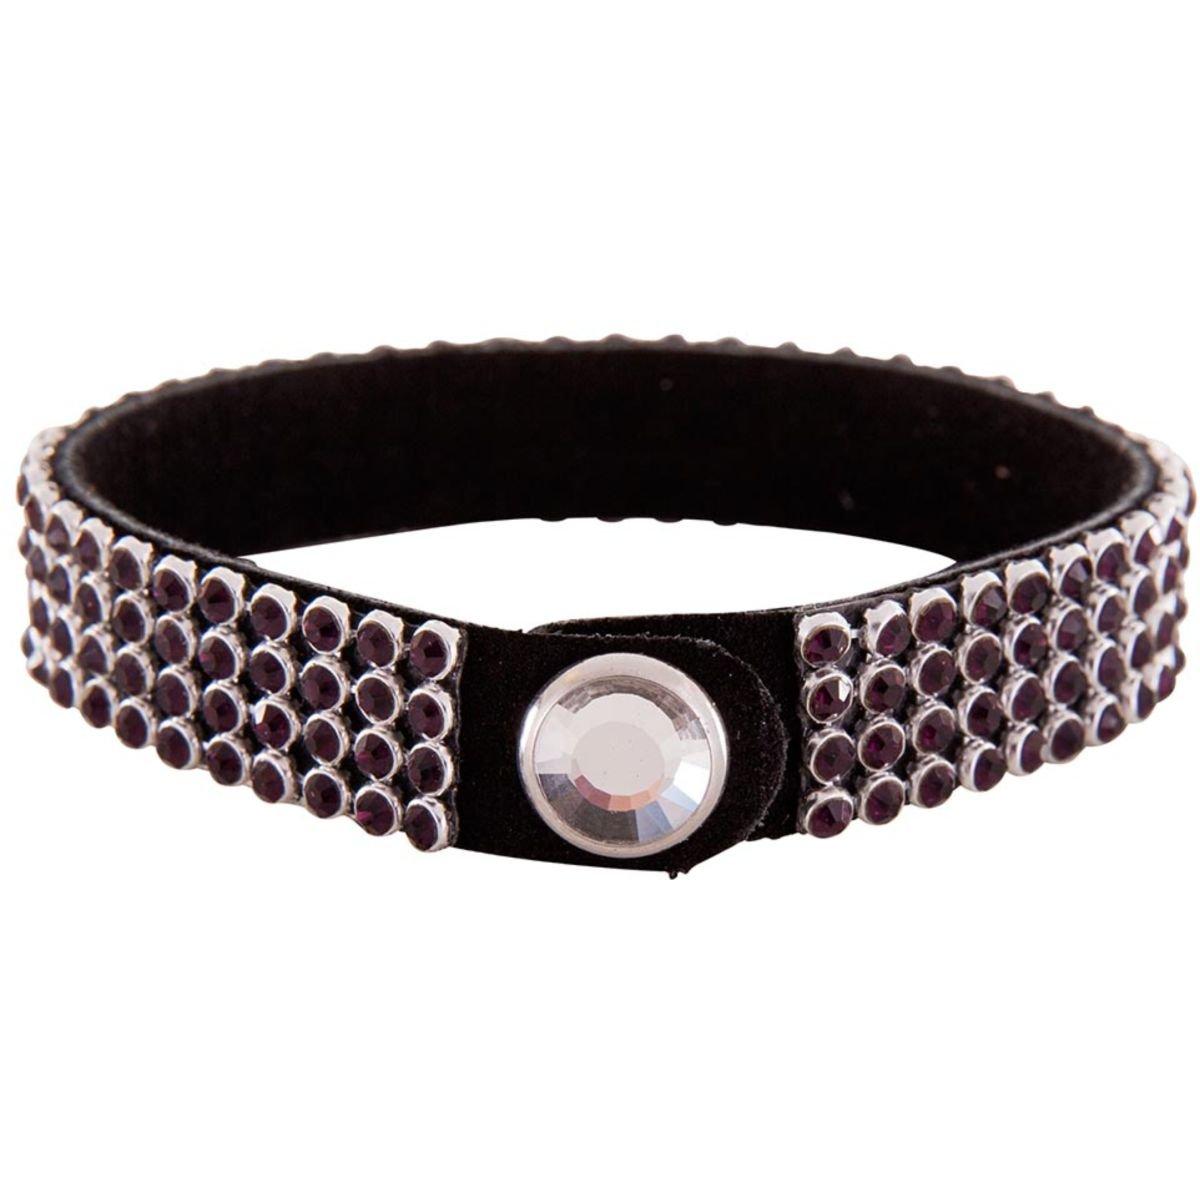 Afbeelding van BR Armband Crystallized met Rhinestone Button Paars